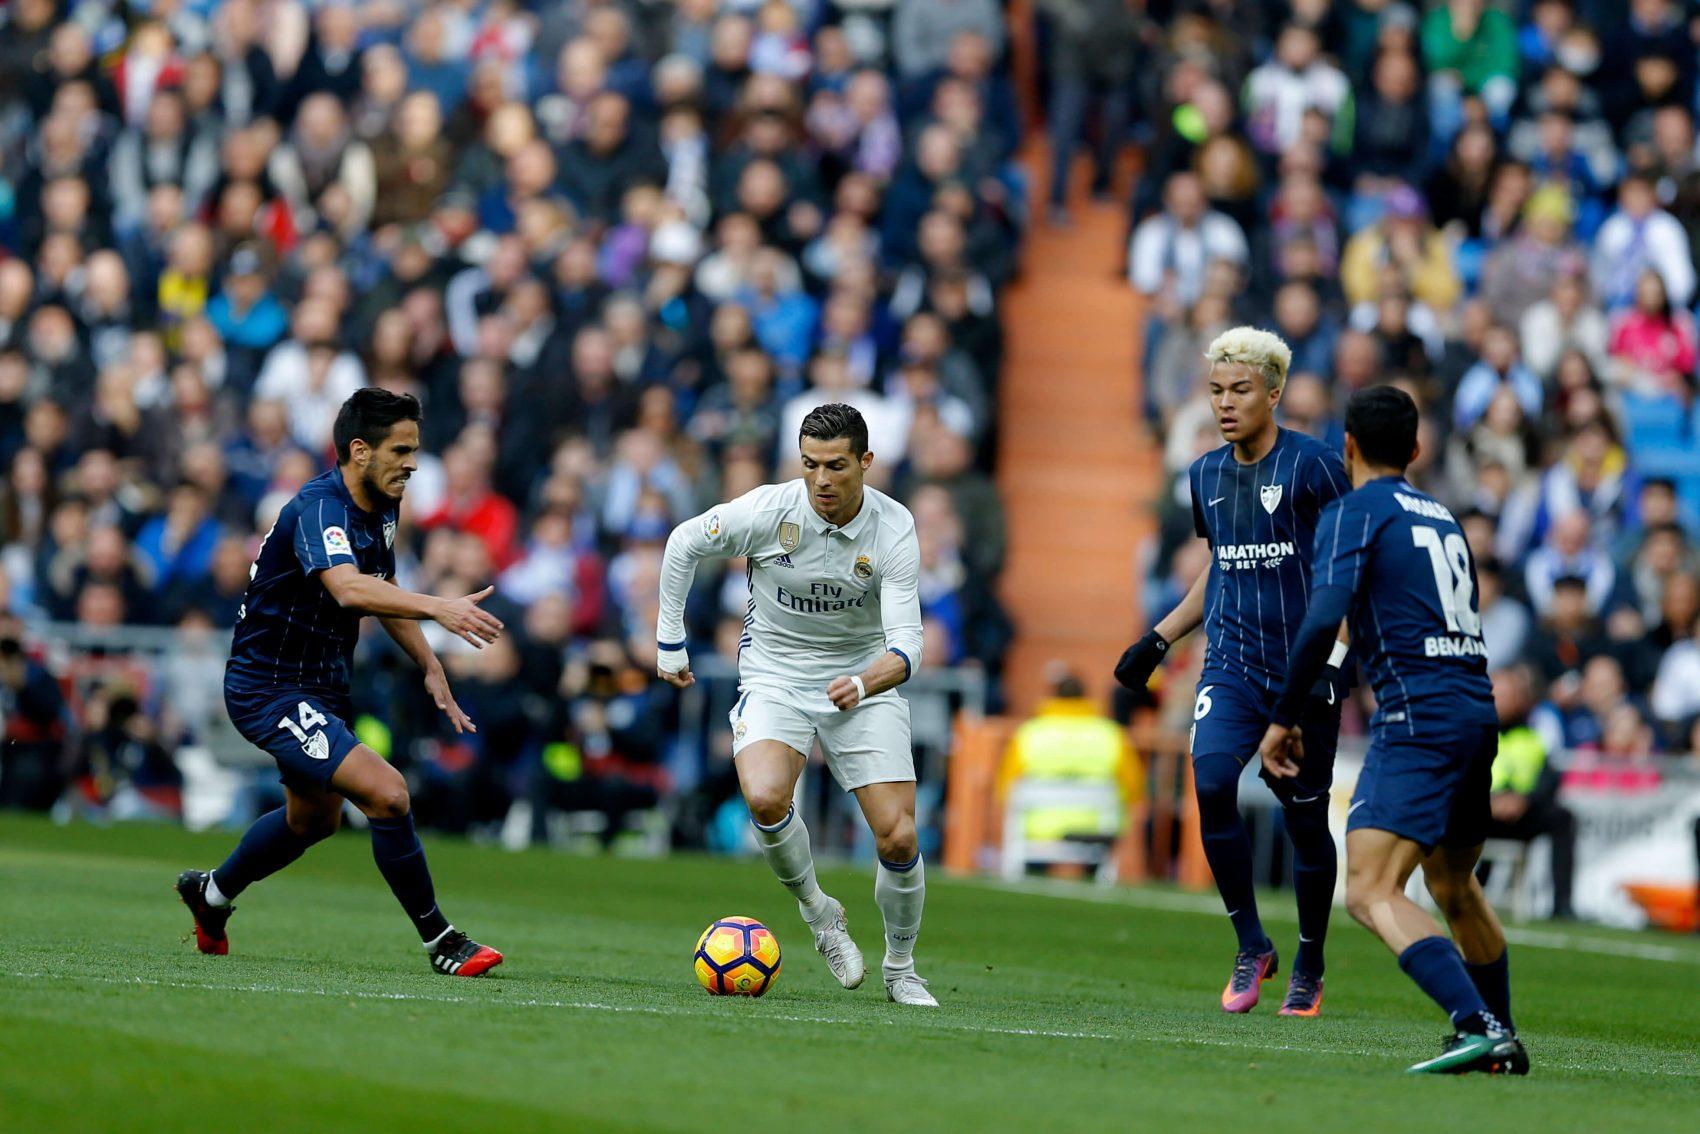 Štvrťfinále Copa del Rey, Celta Vigo – Real Madrid